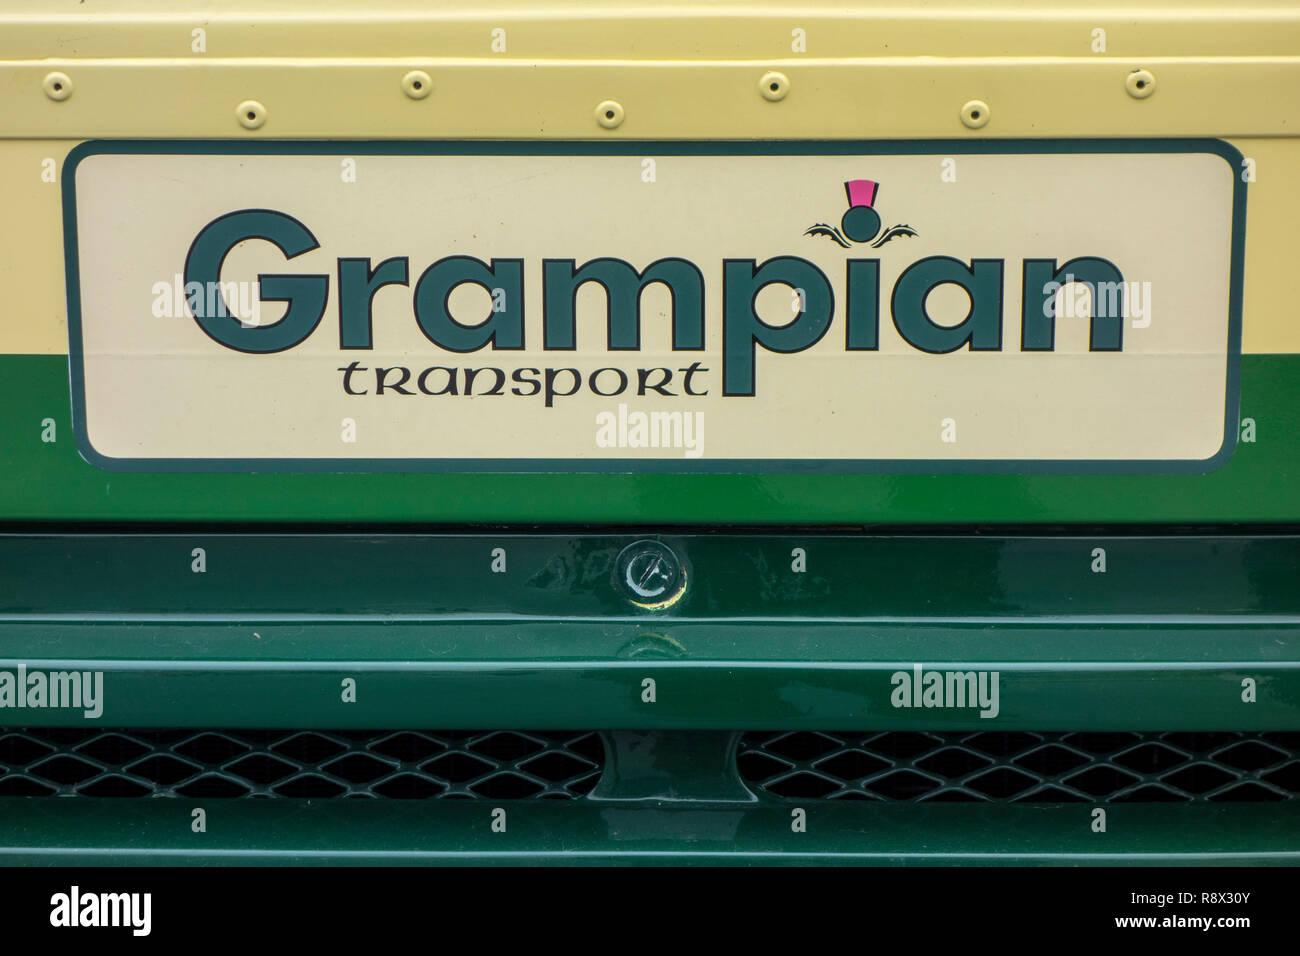 1988 Leyland Olympian double-decker bus, close-up of Grampian Transport logo - Stock Image